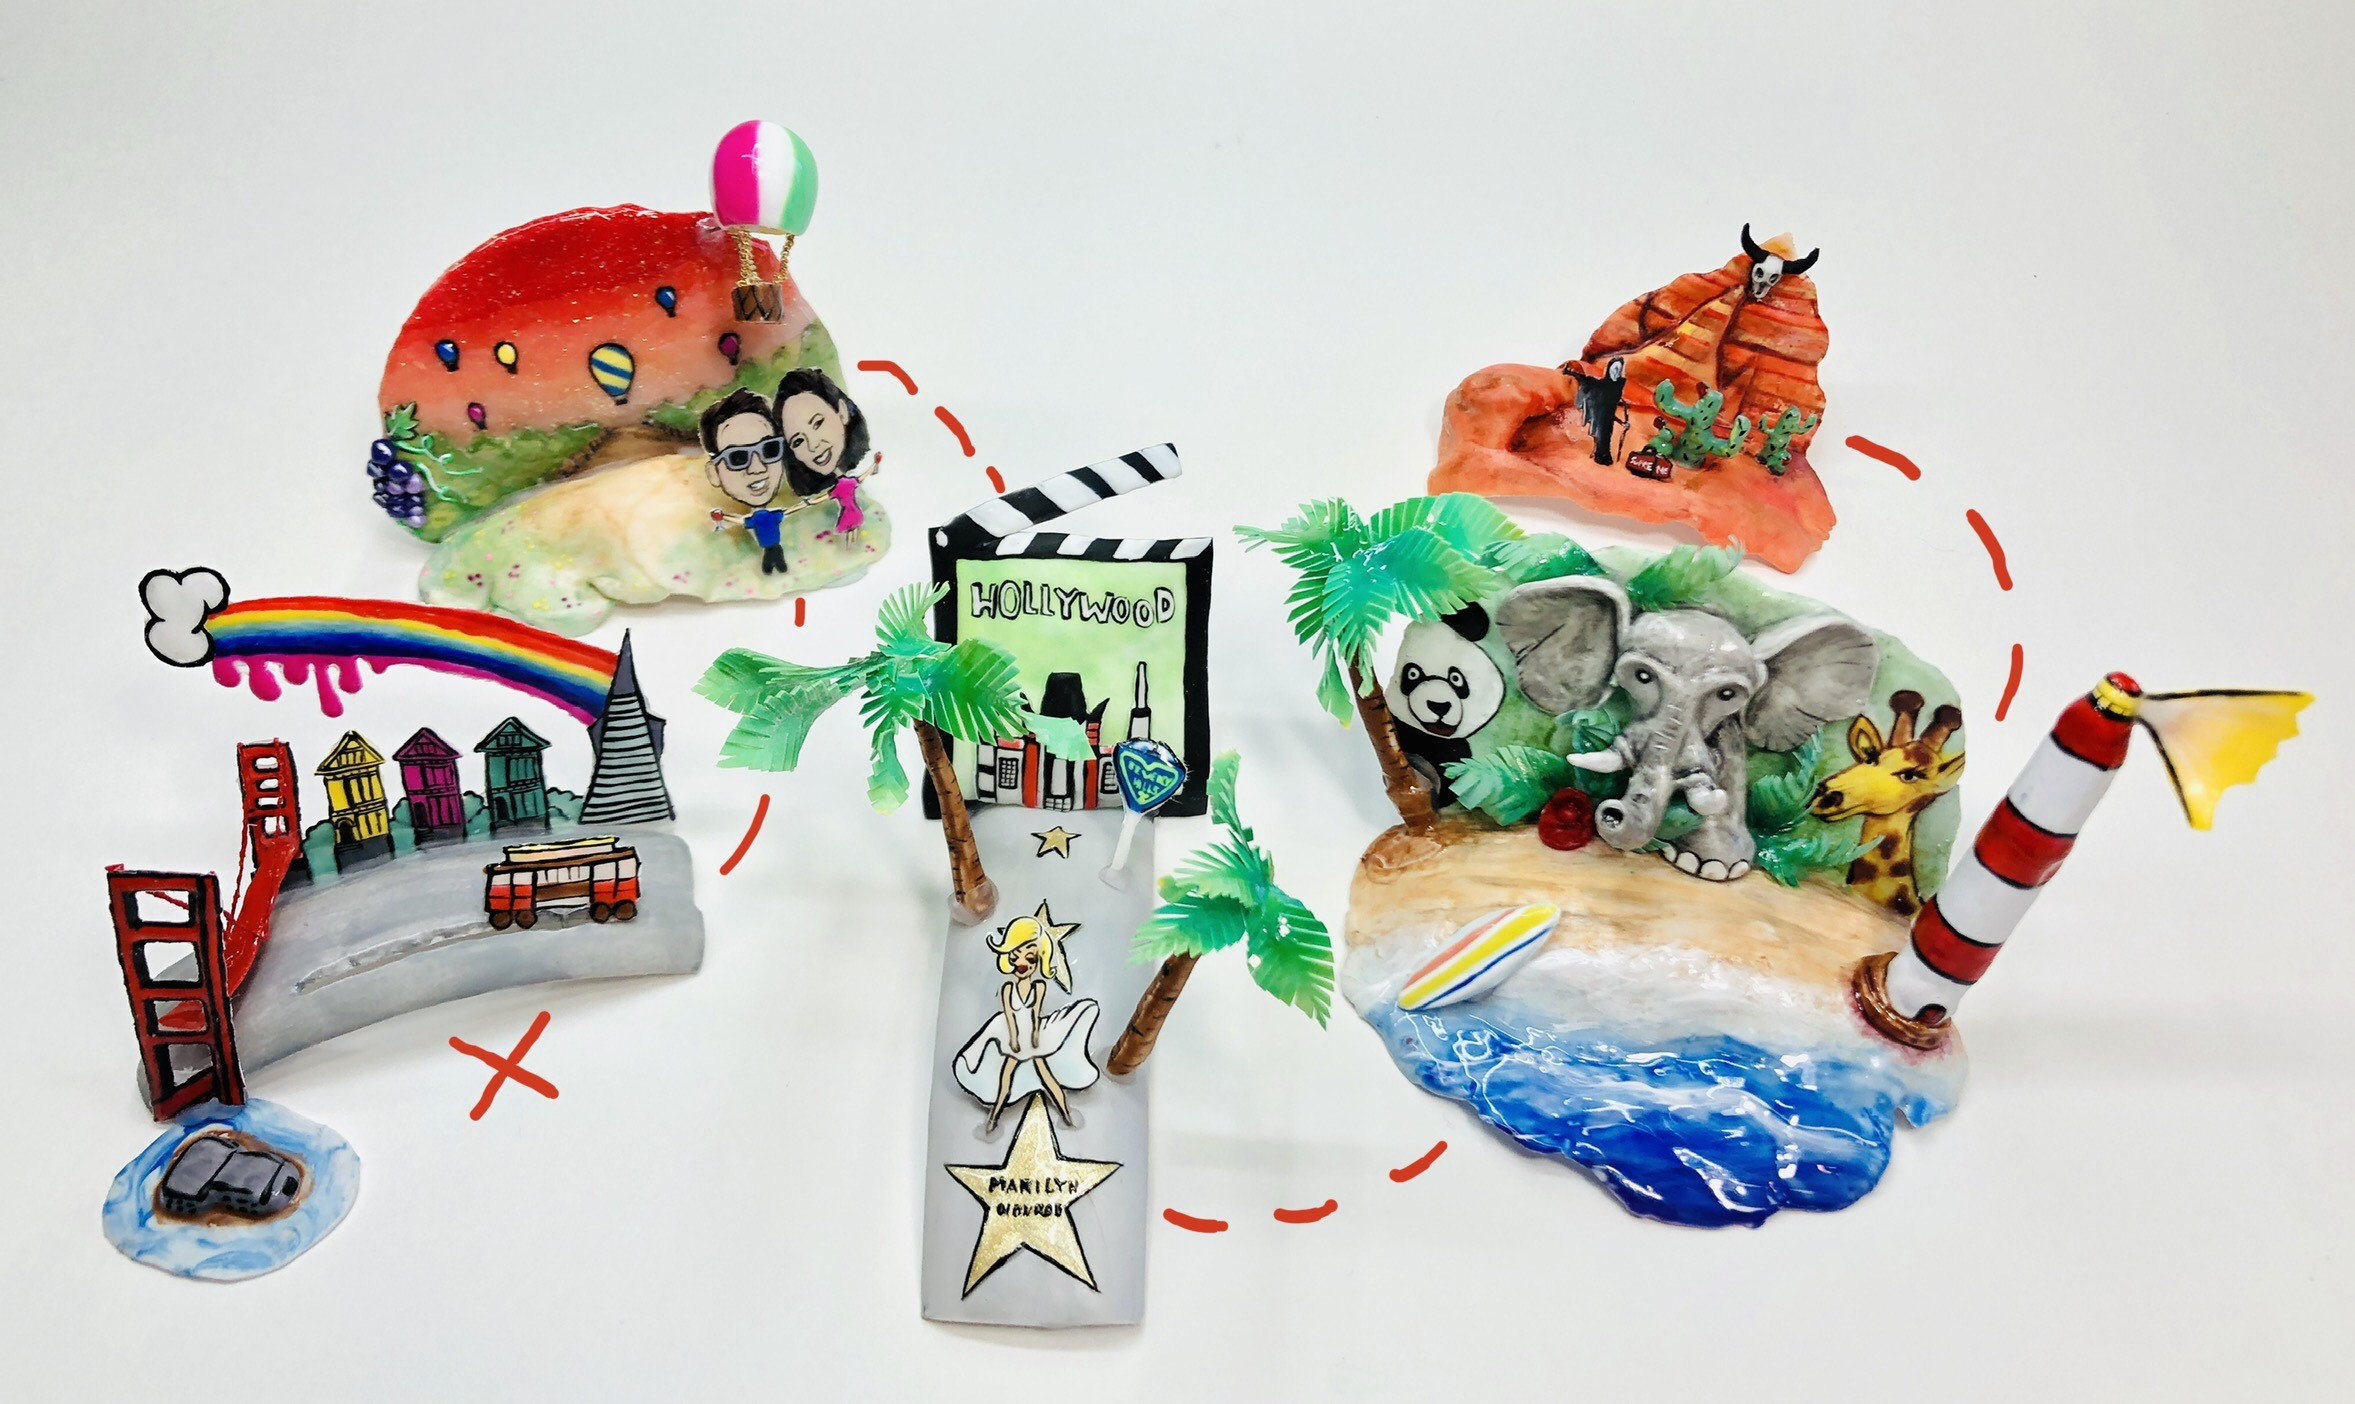 OPI NTNA Challenge 2: California Dreaming (Melisa)